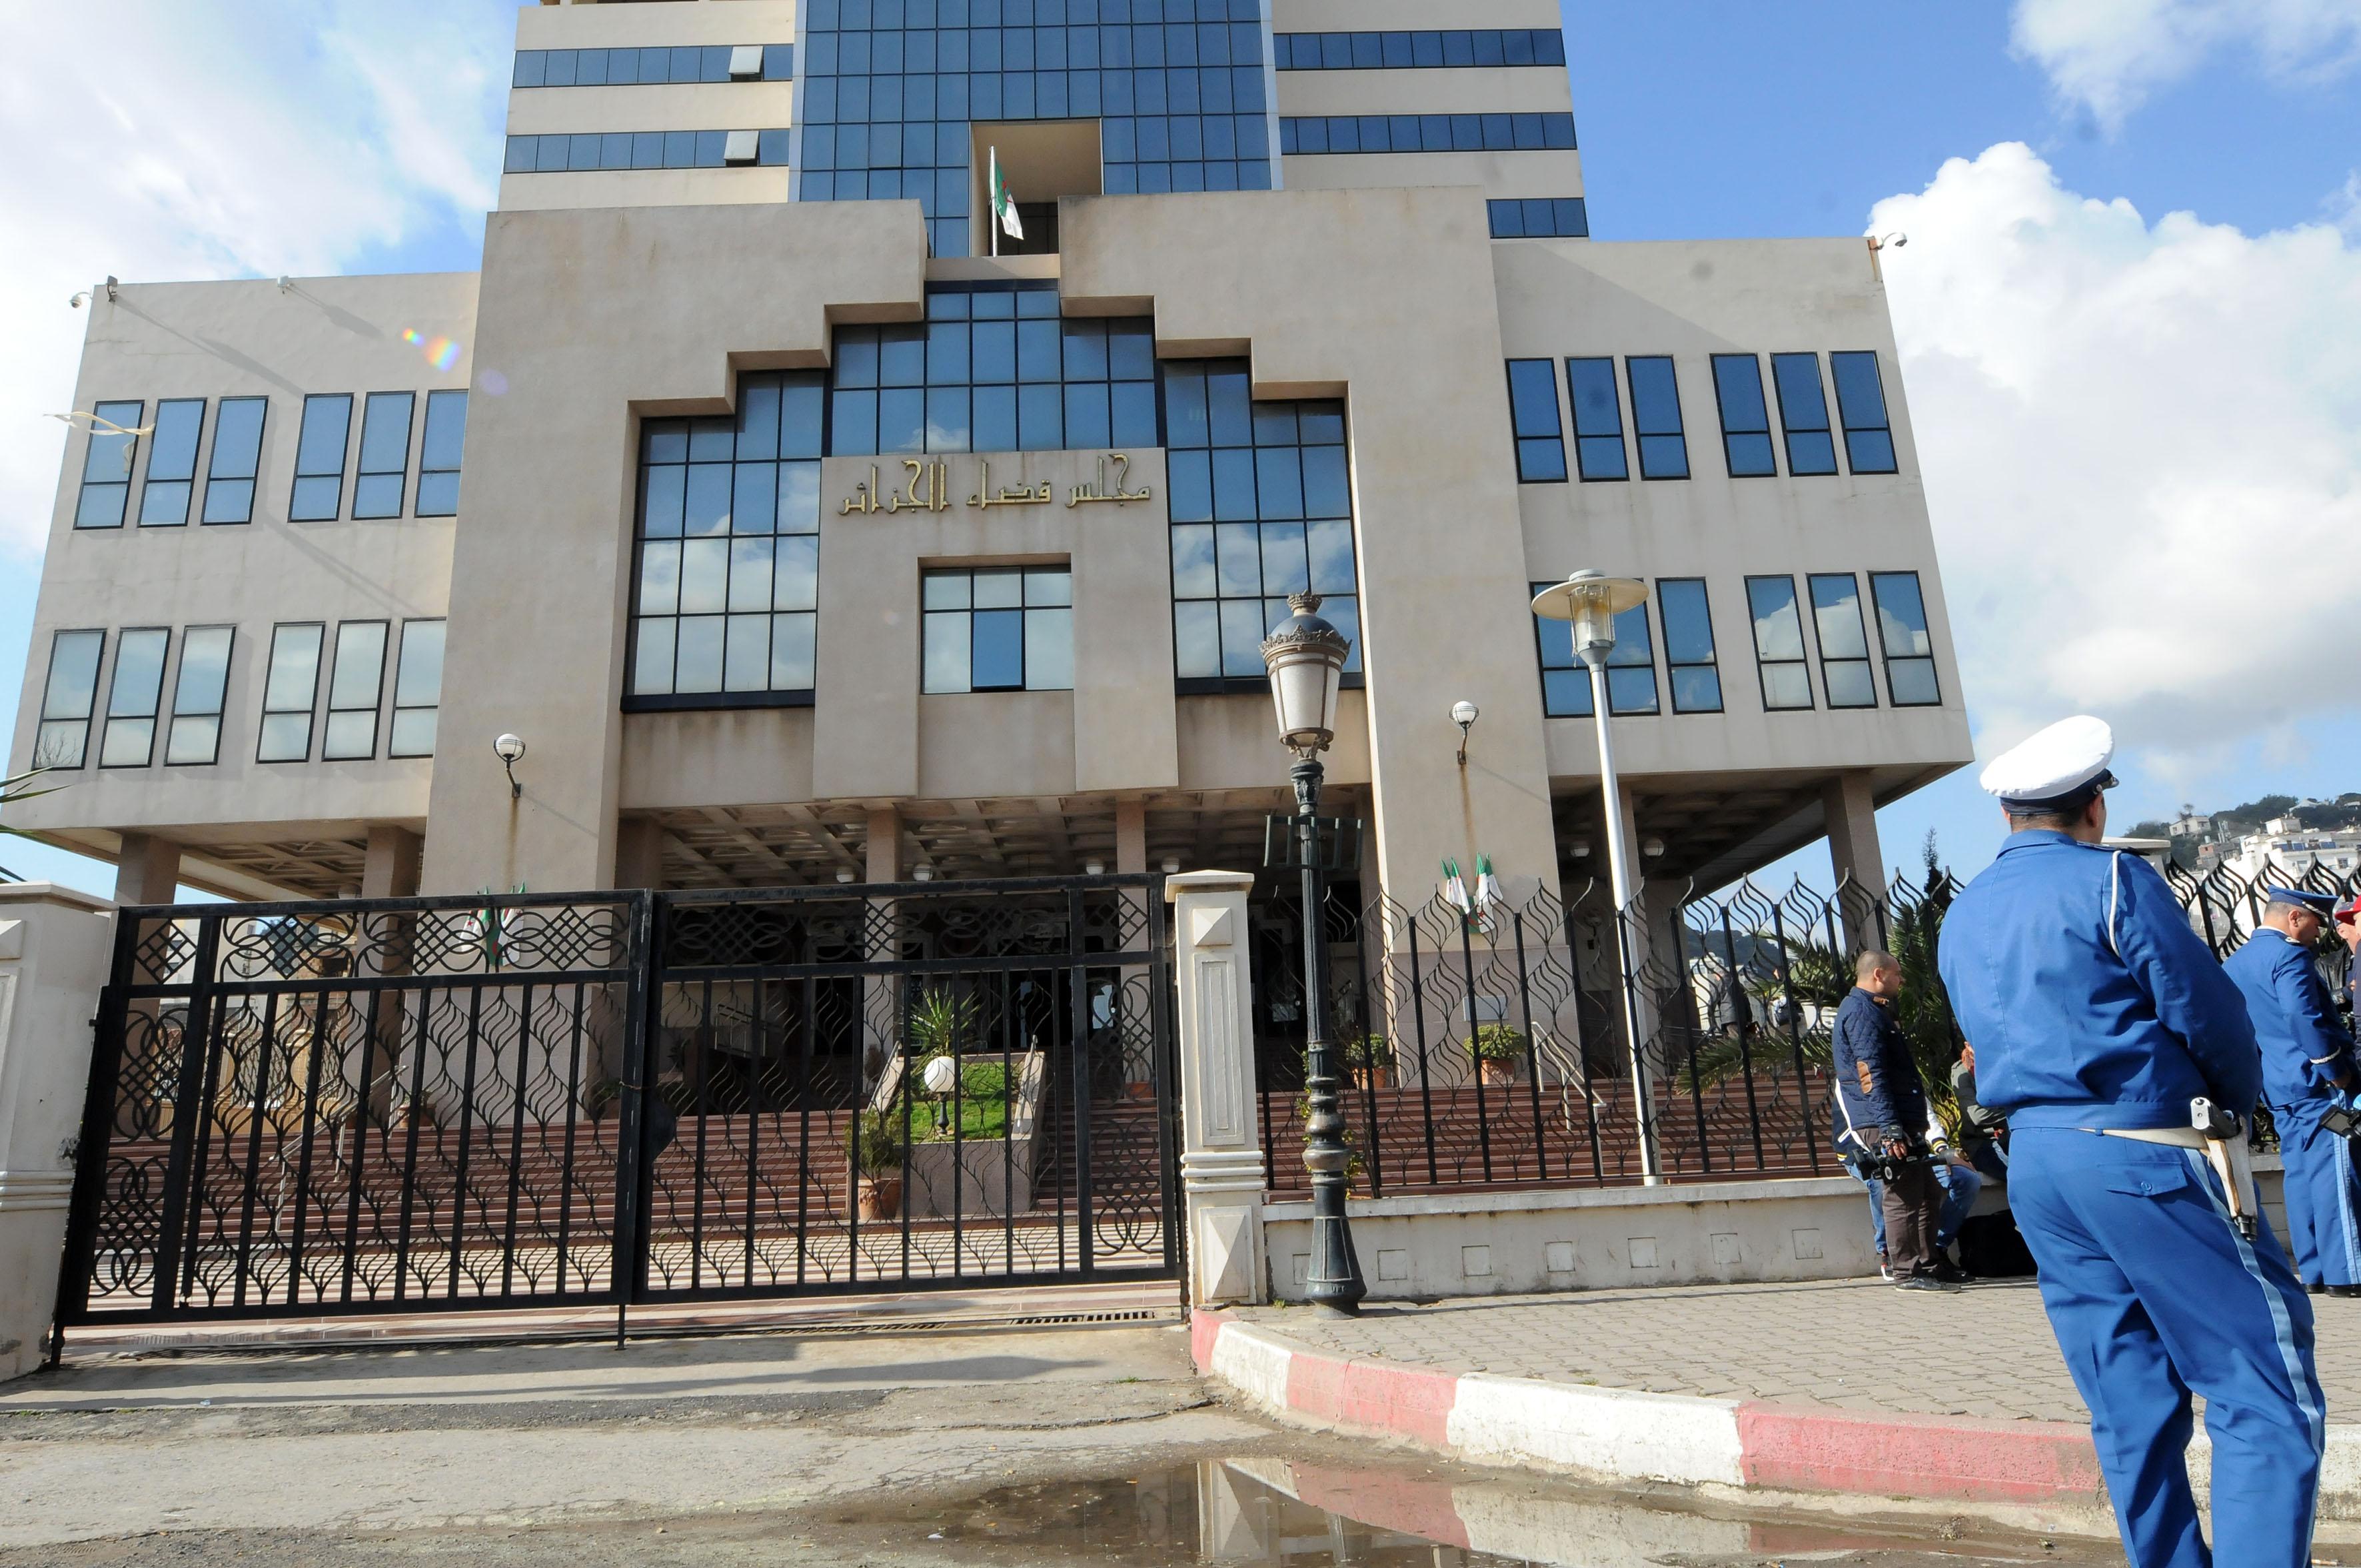 Le tribunal de Sidi M'hamed. New Press